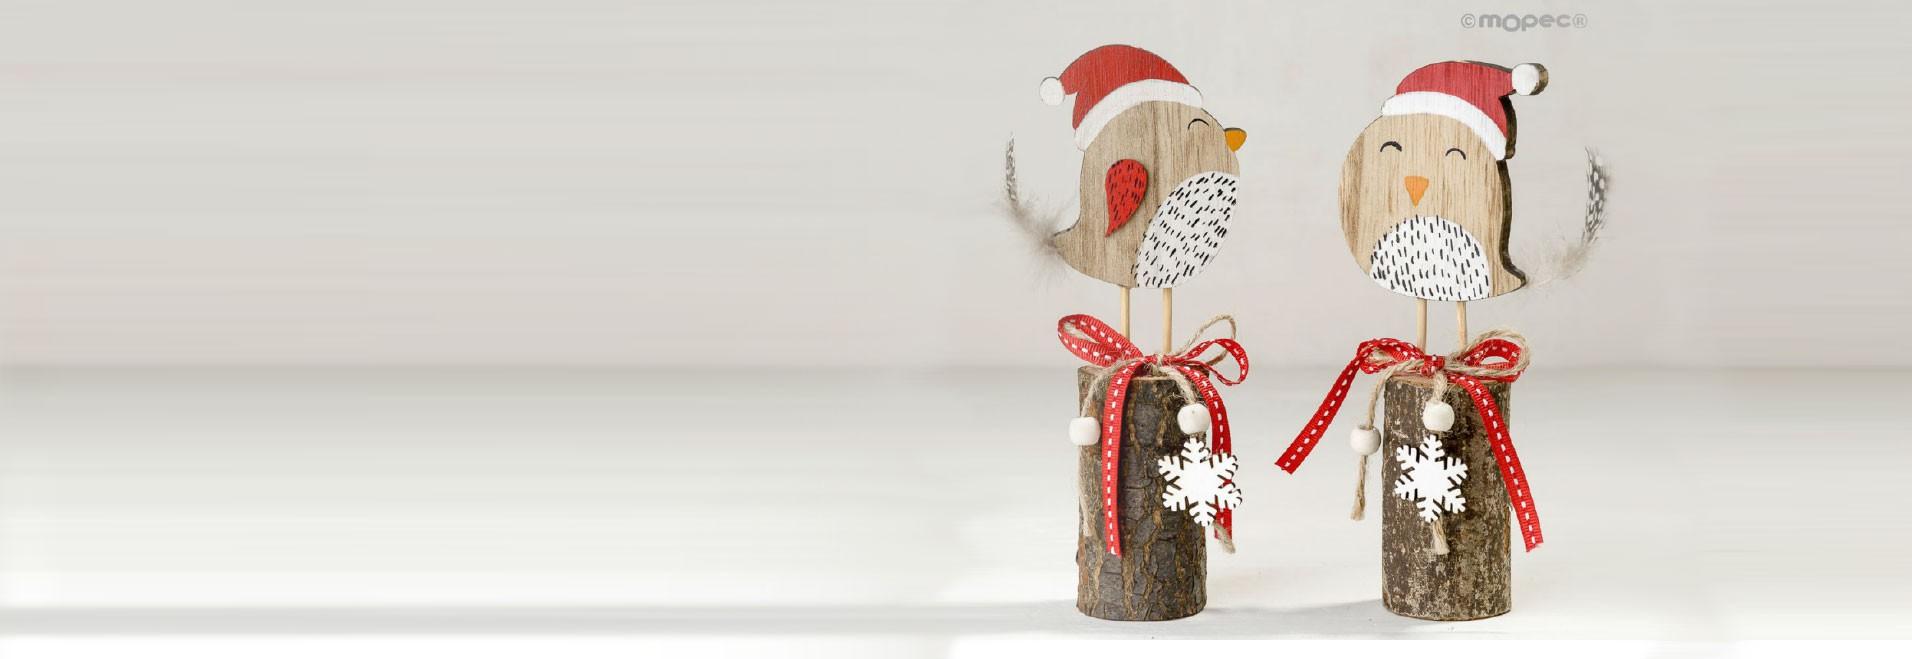 Decoración de madera figuritas con gorro de Papá Noel navideño